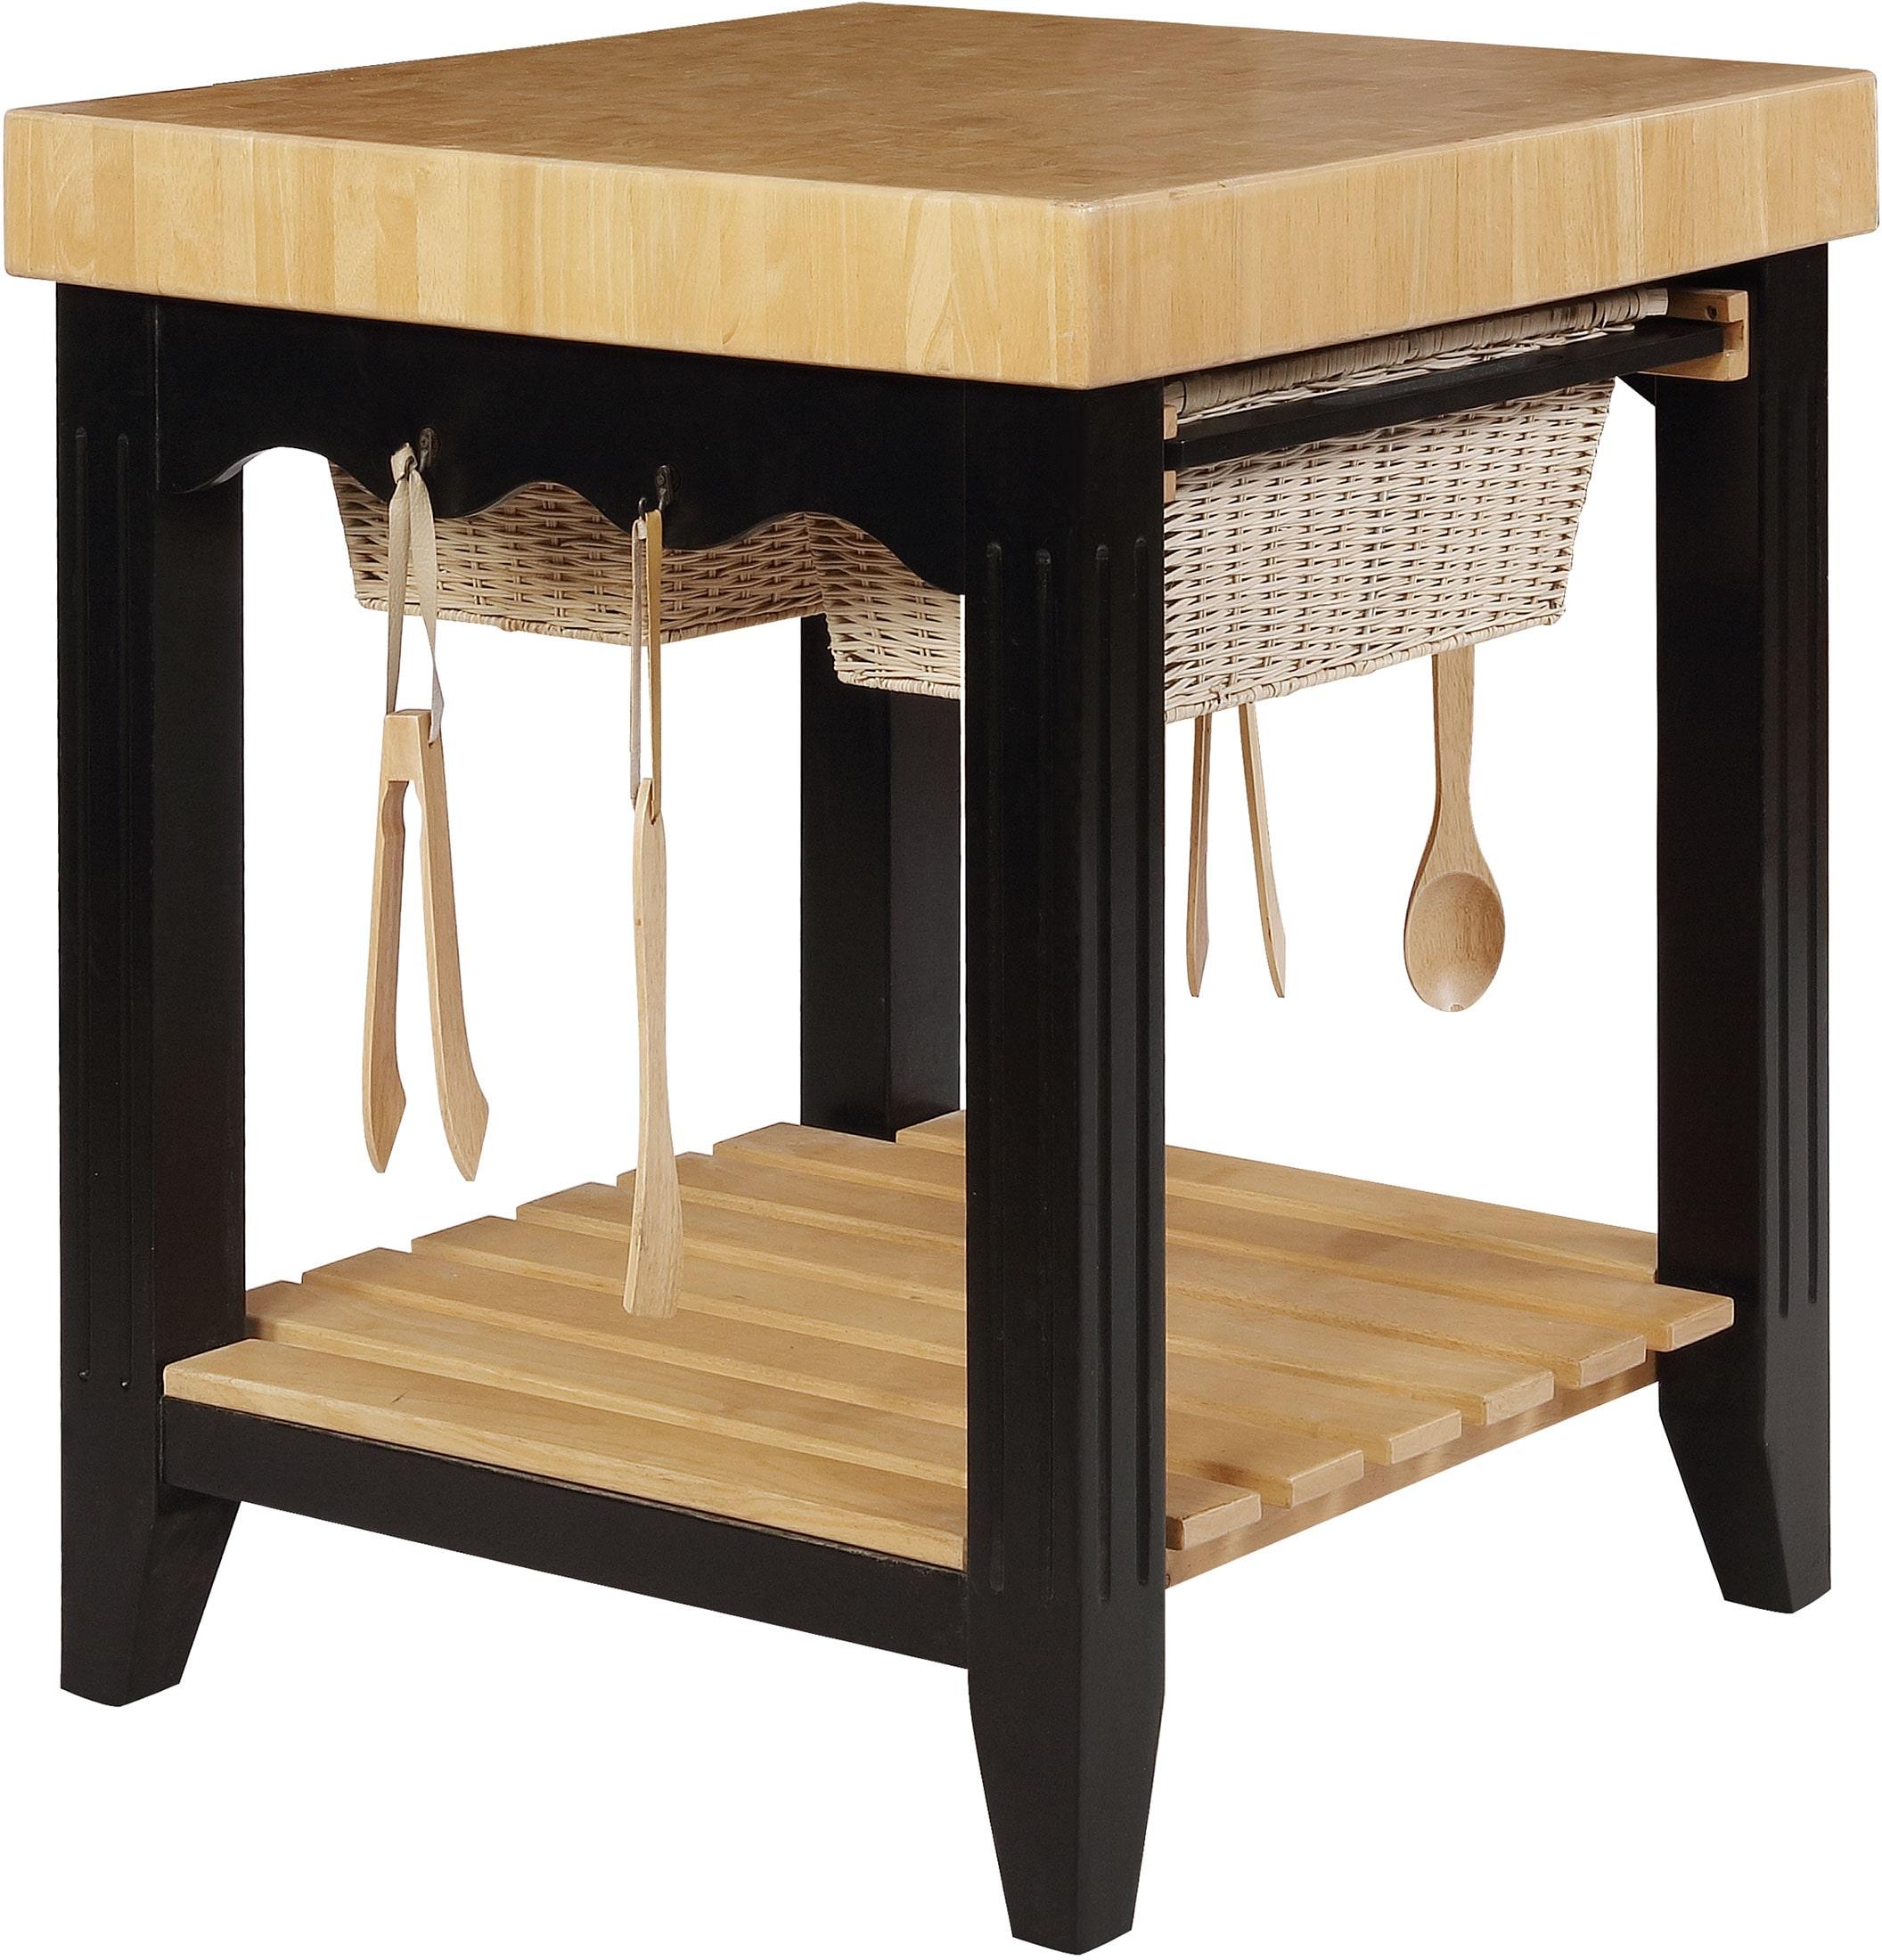 Dining Room Furniture - Savannah Kitchen Island